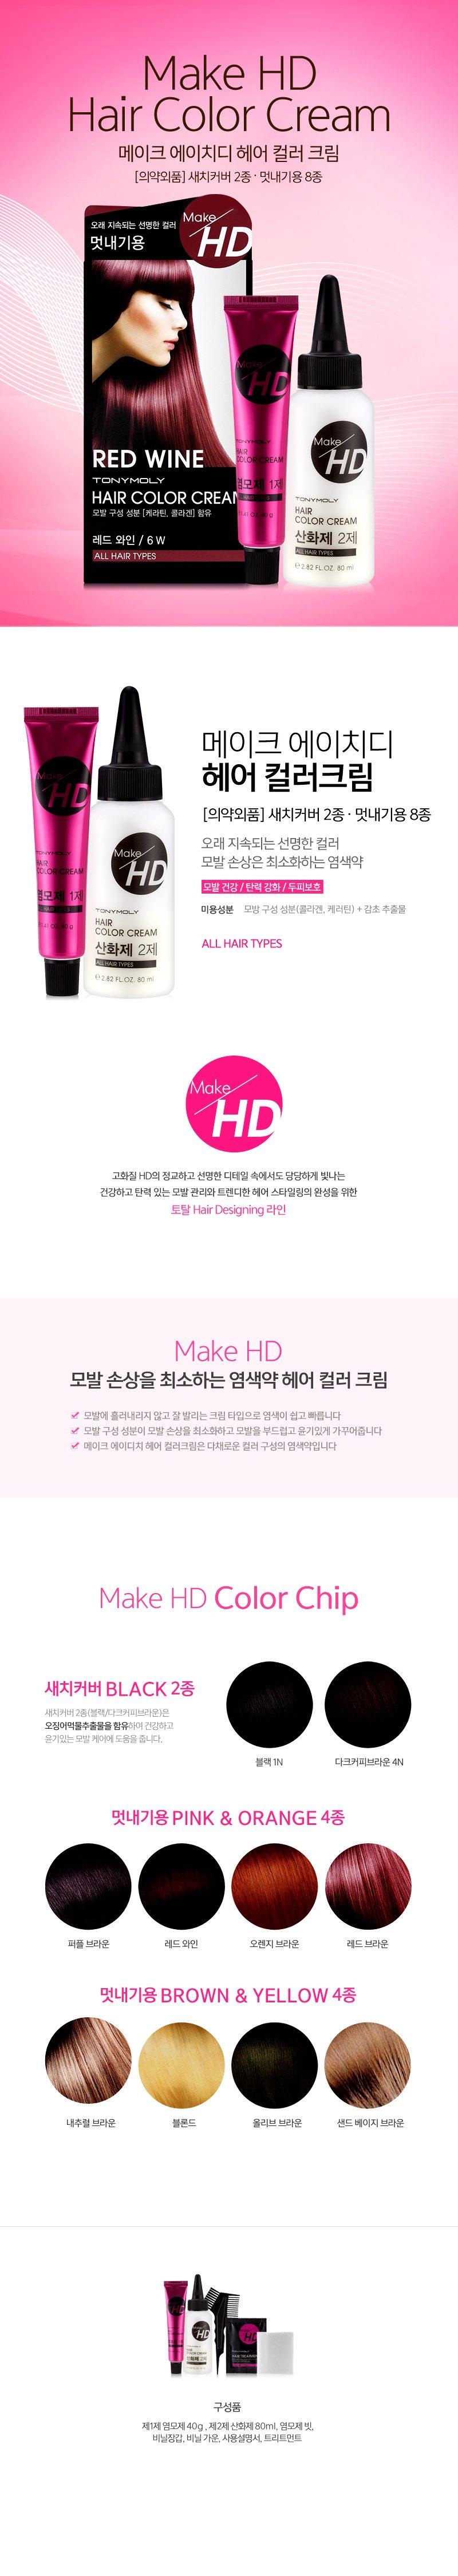 Tony Moly Make Hd Hair Color Cream Korean Cosmetic Shop Malaysia